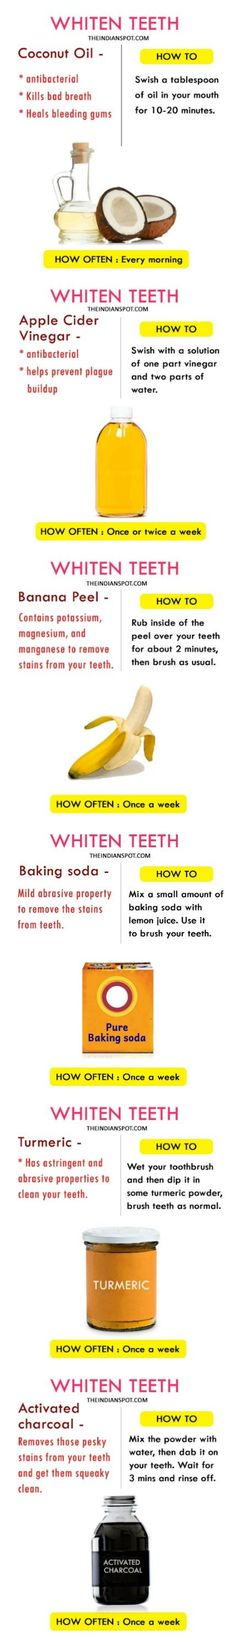 whiten teeth http://reviewscircle.com/health-fitness/dental-health/natural-teeth-whitening/